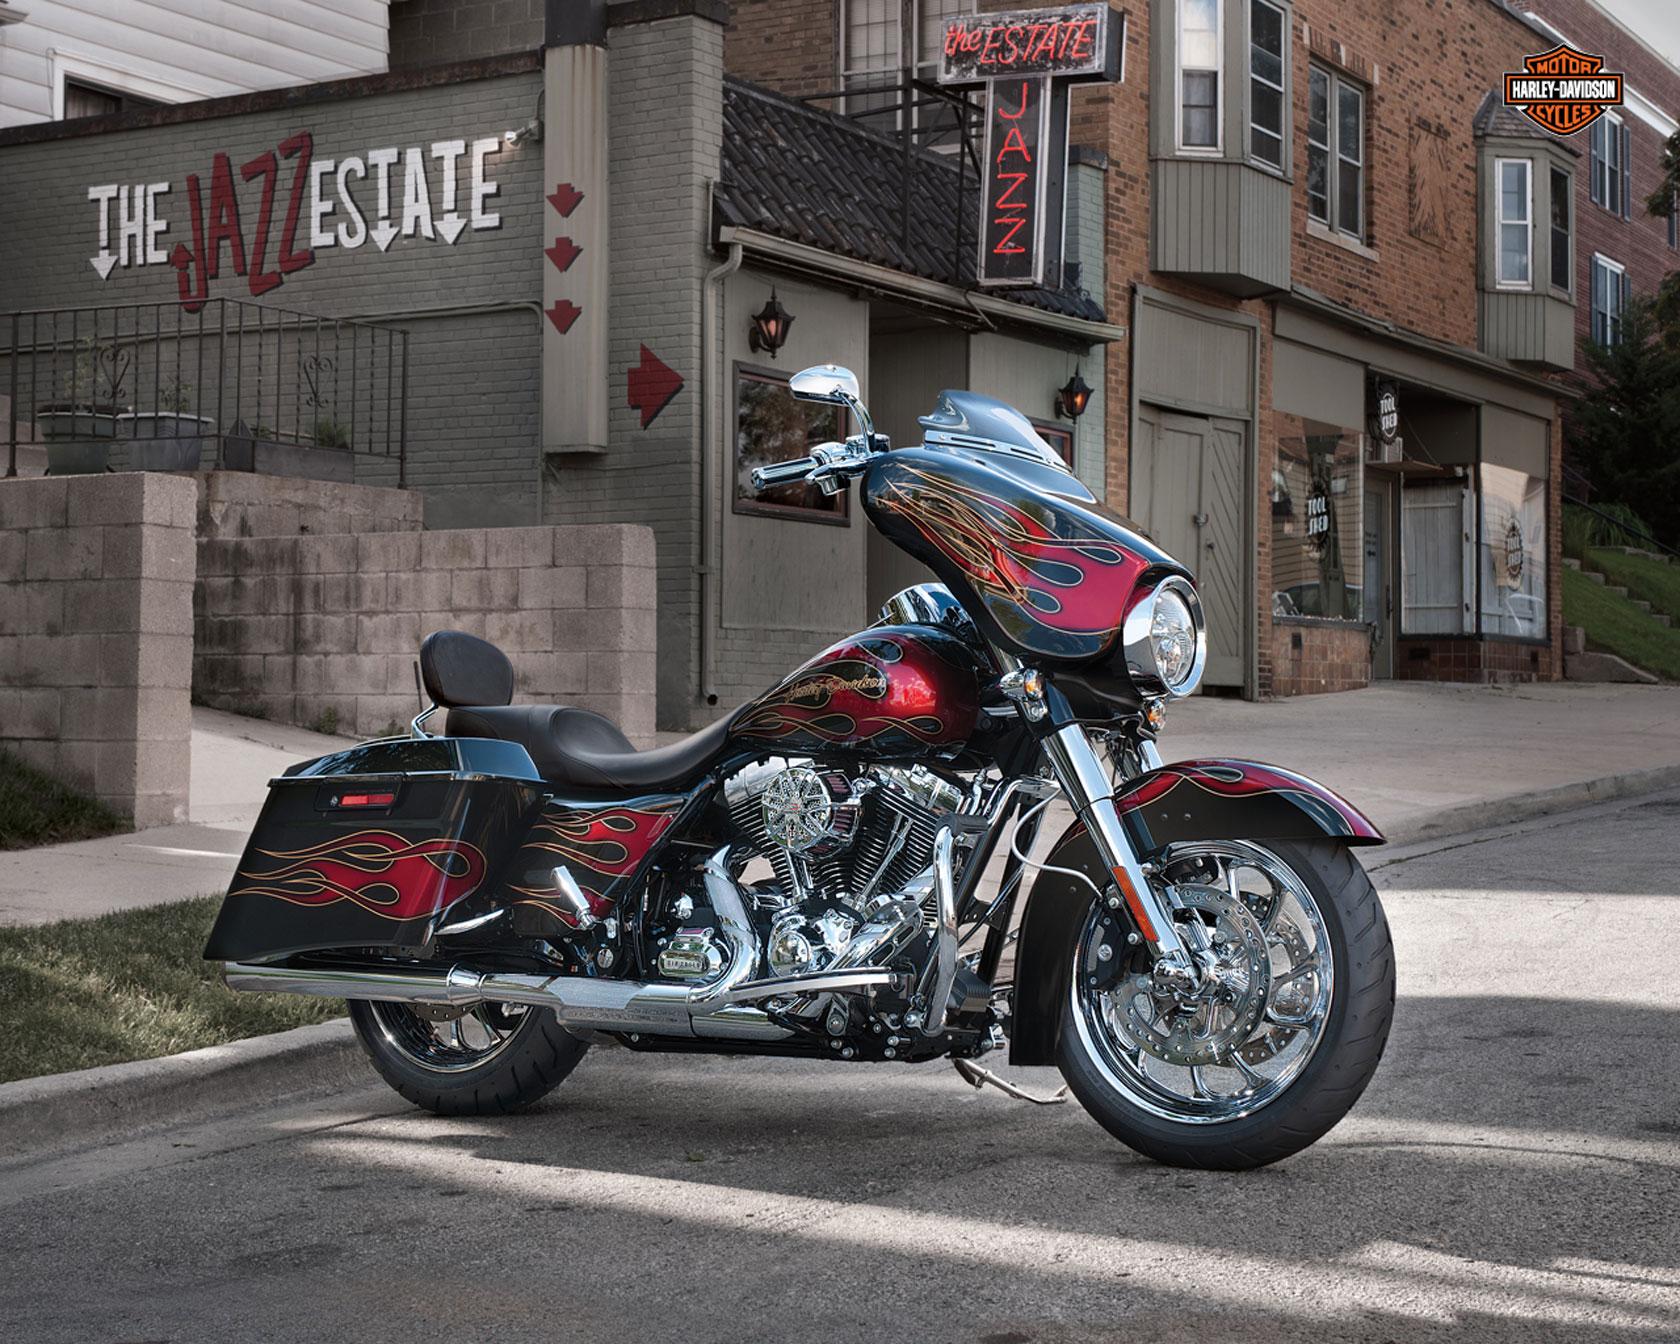 Street glide wallpapers and screensavers wallpapersafari 2013 harley davidson flhx street glide q wallpaper 1680x1344 87081 voltagebd Choice Image